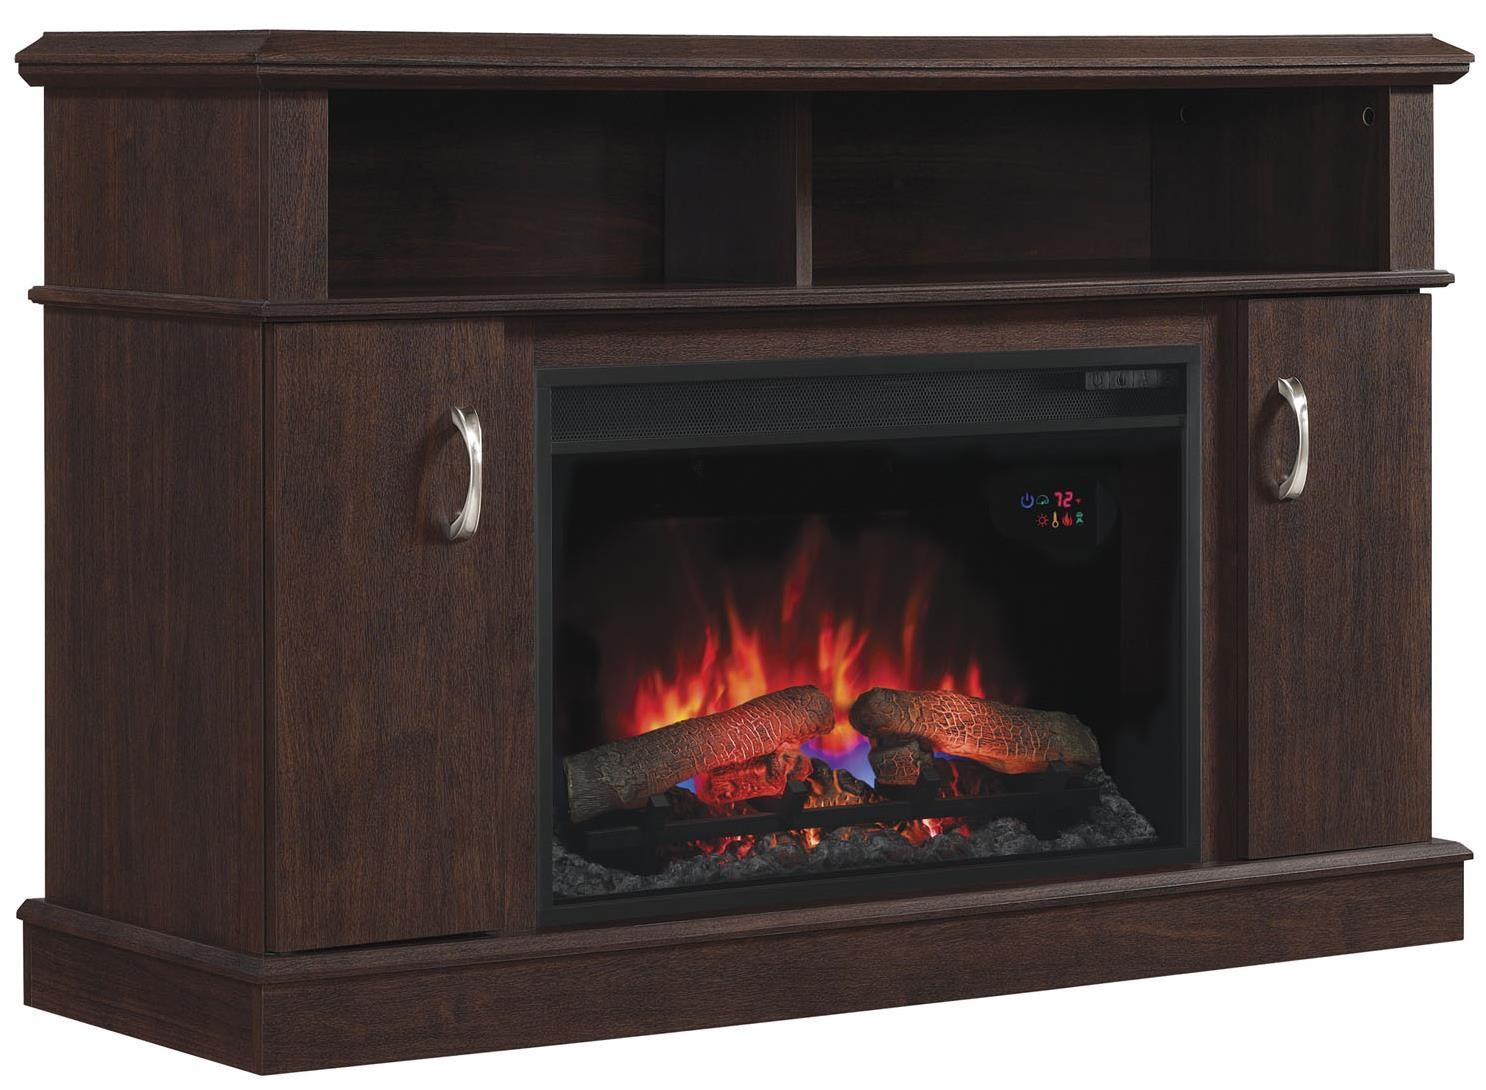 "ClassicFlame Dwell 26"" Media Fireplace Mantel"